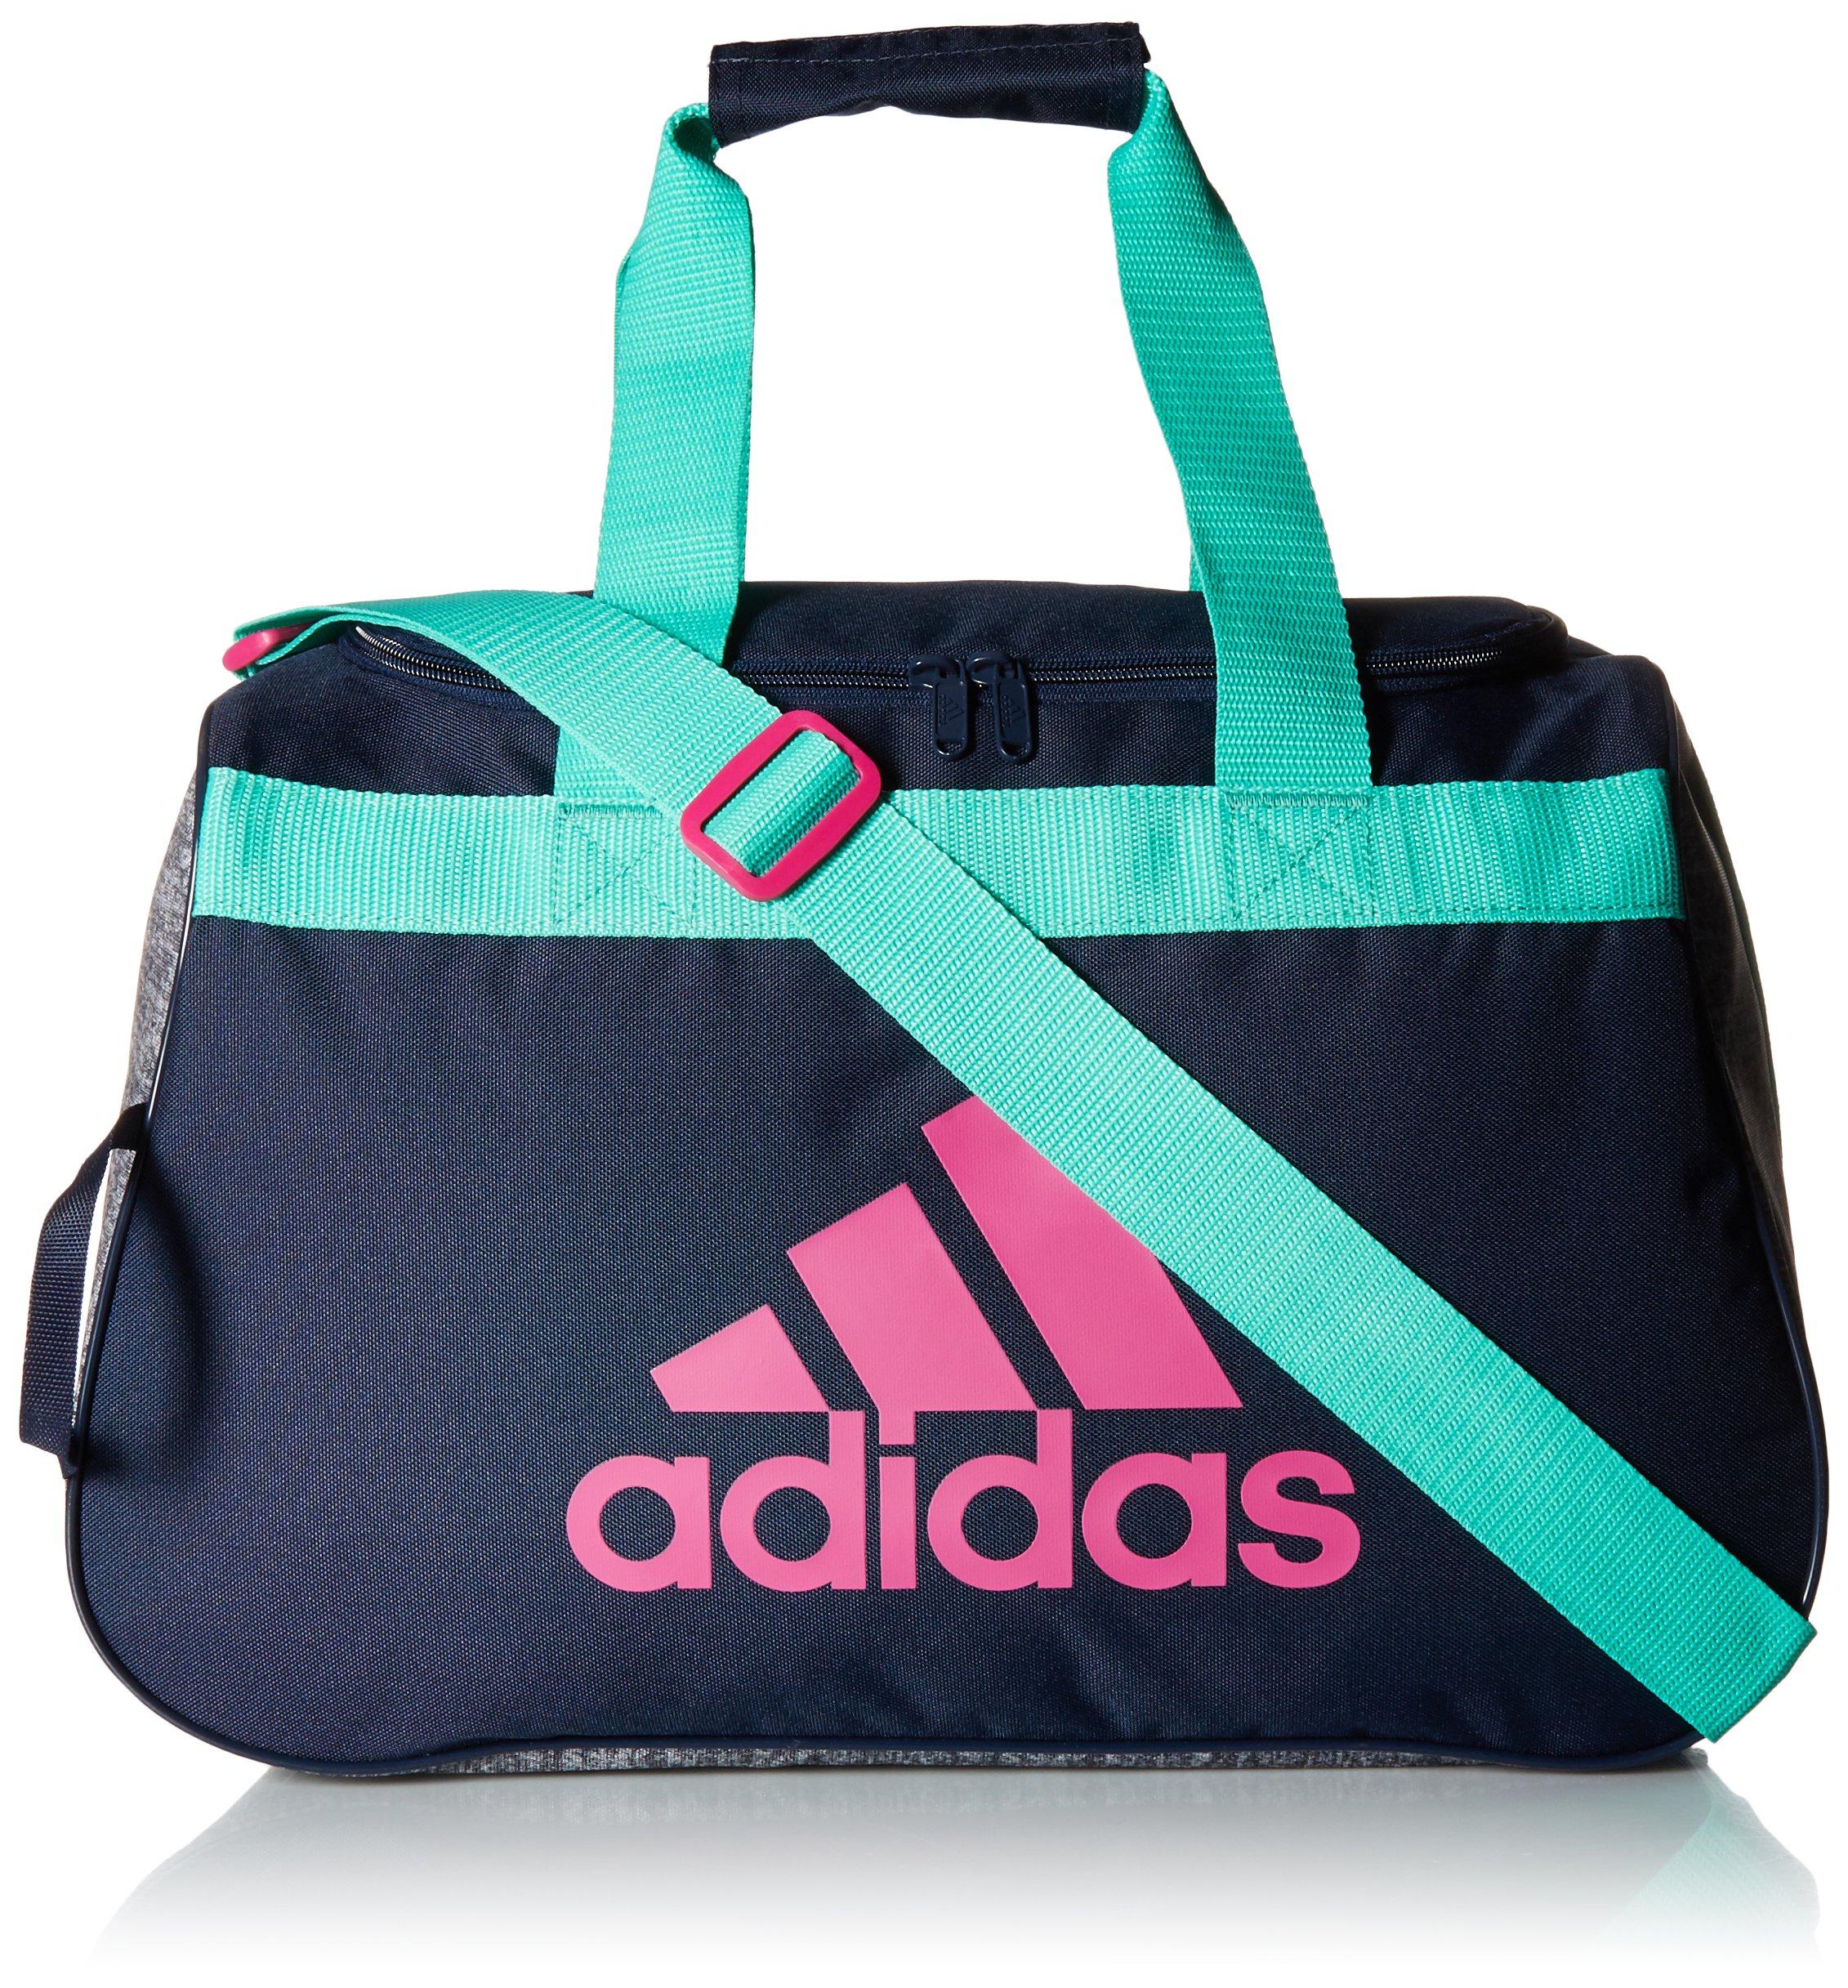 adidas Diablo Small Duffel Bag, Green/Bahia Magenta, One Size